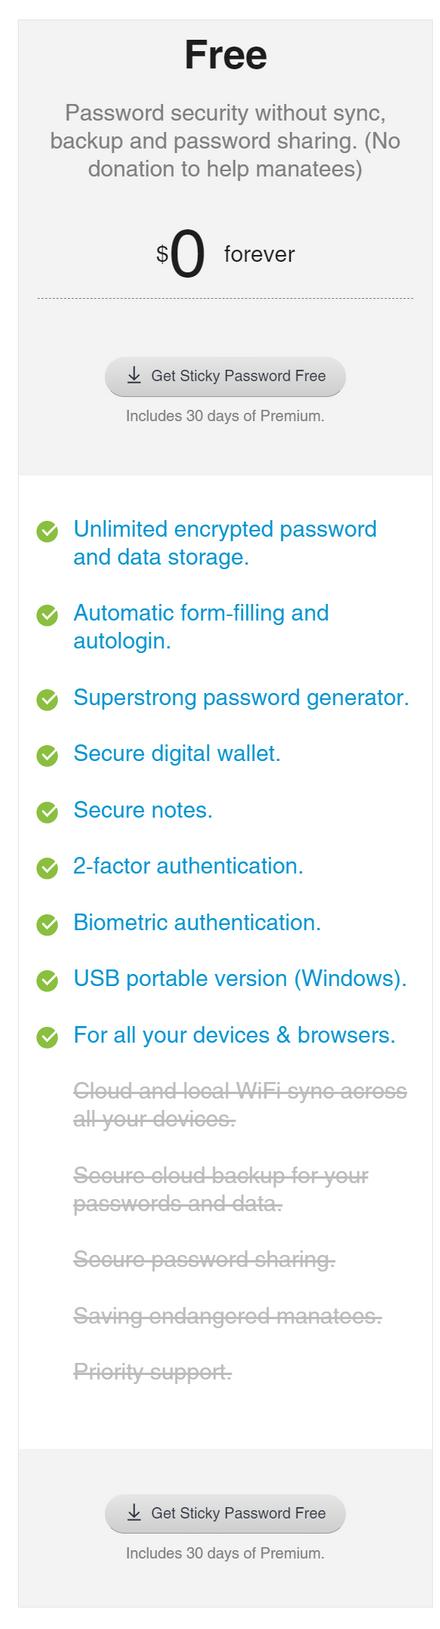 Sticky Password Free Plan